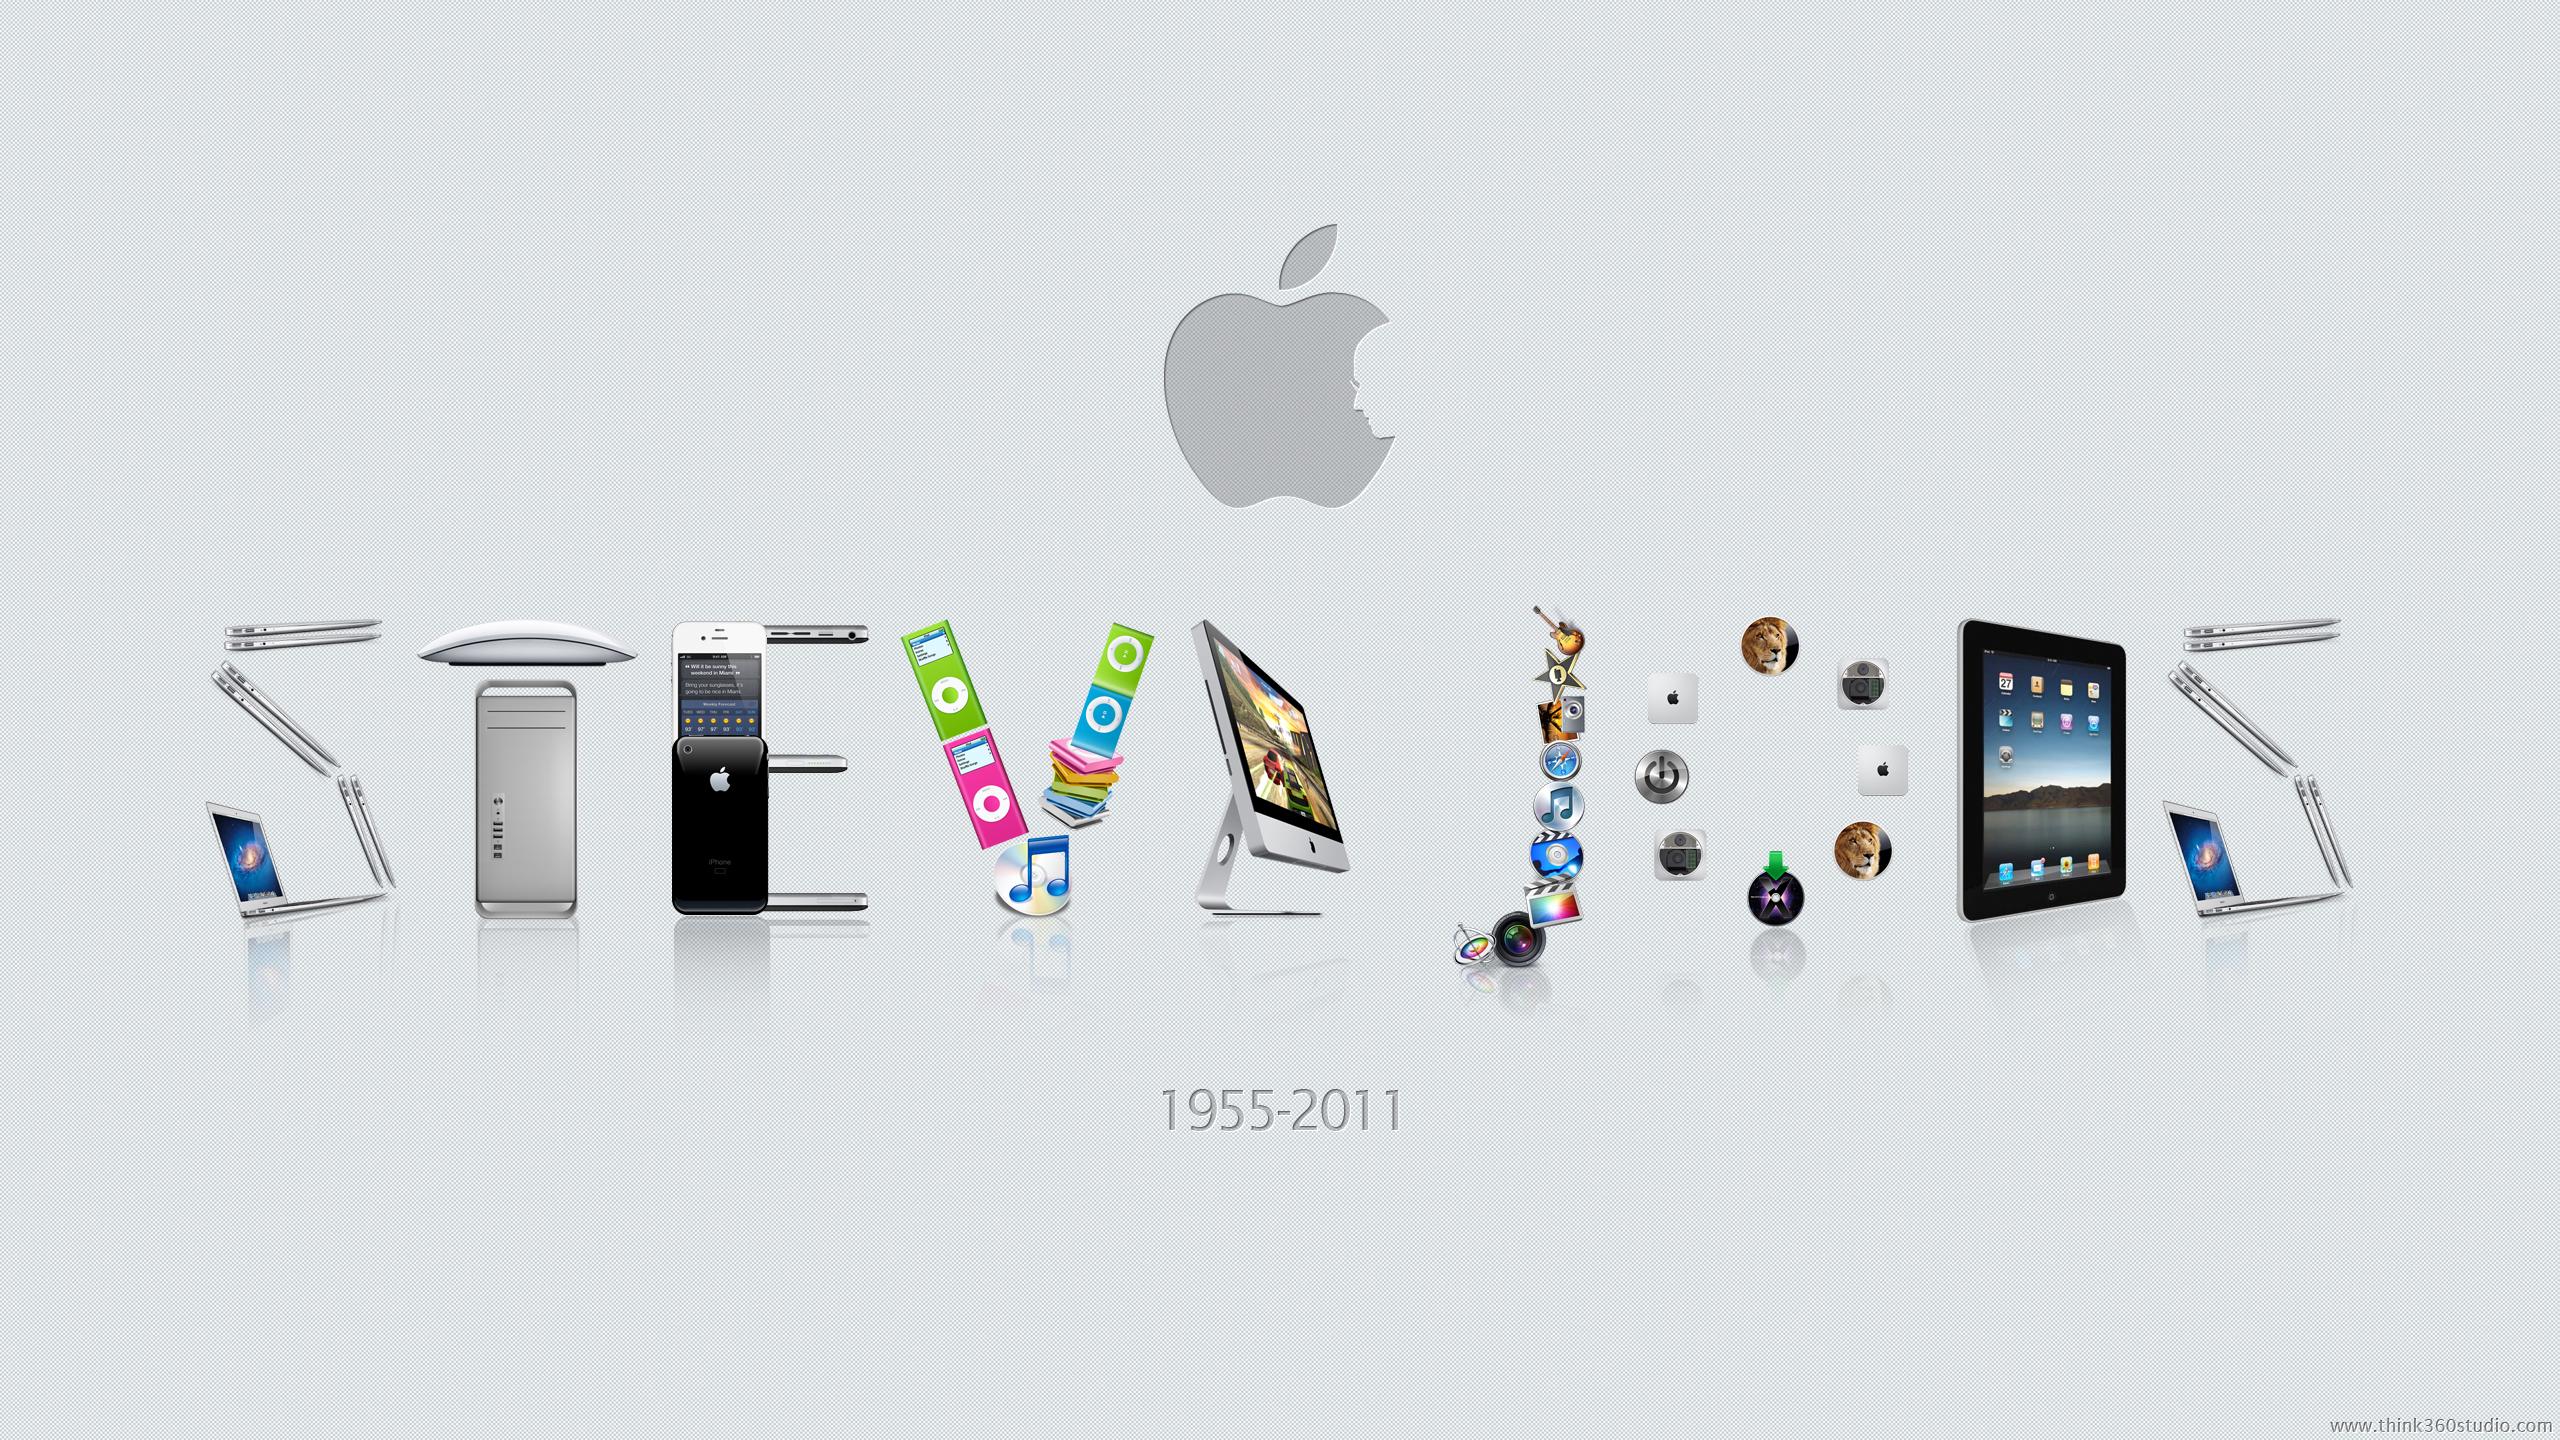 A Tribute To Steve Jobs